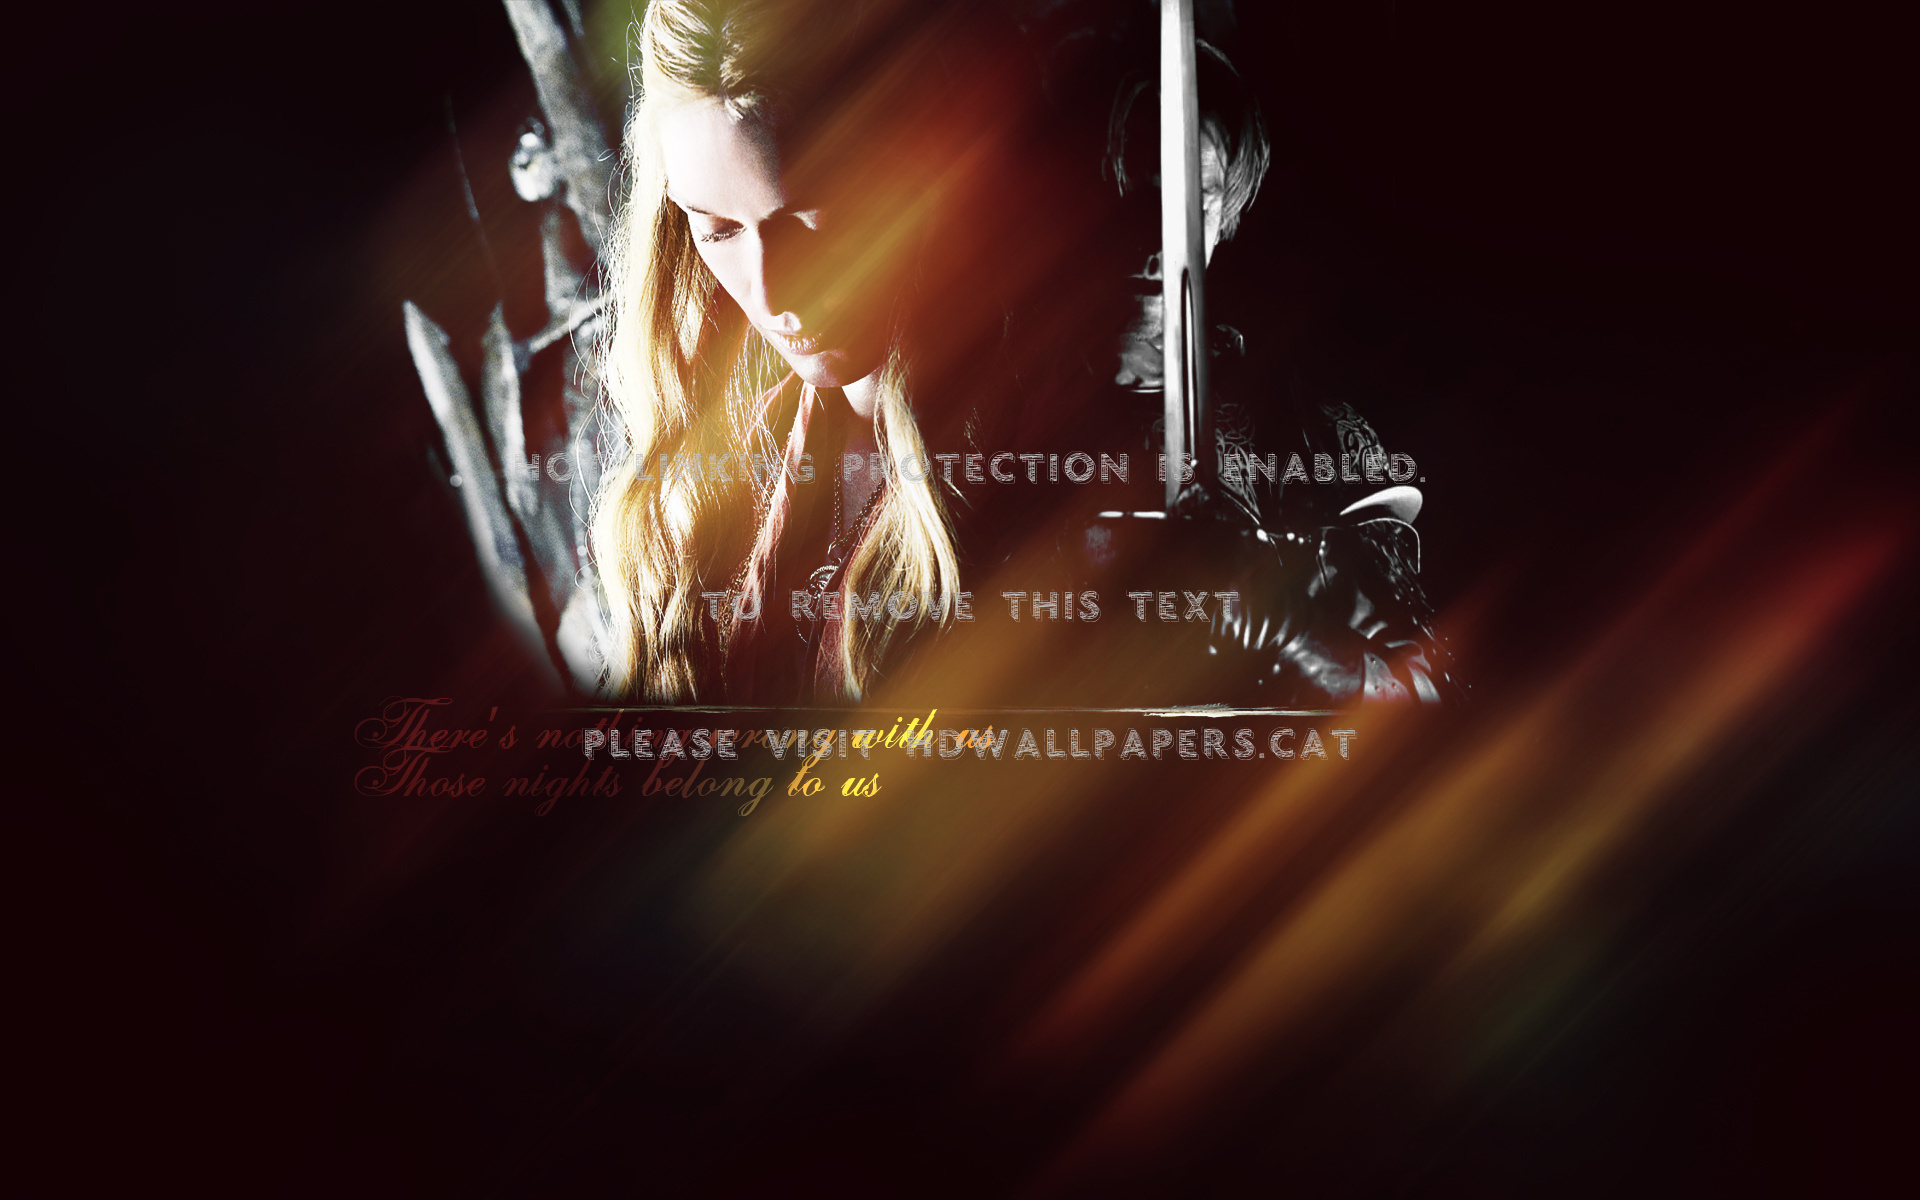 Game Of Thrones-jaime & Cersei Lannister Tv - Darkness - HD Wallpaper